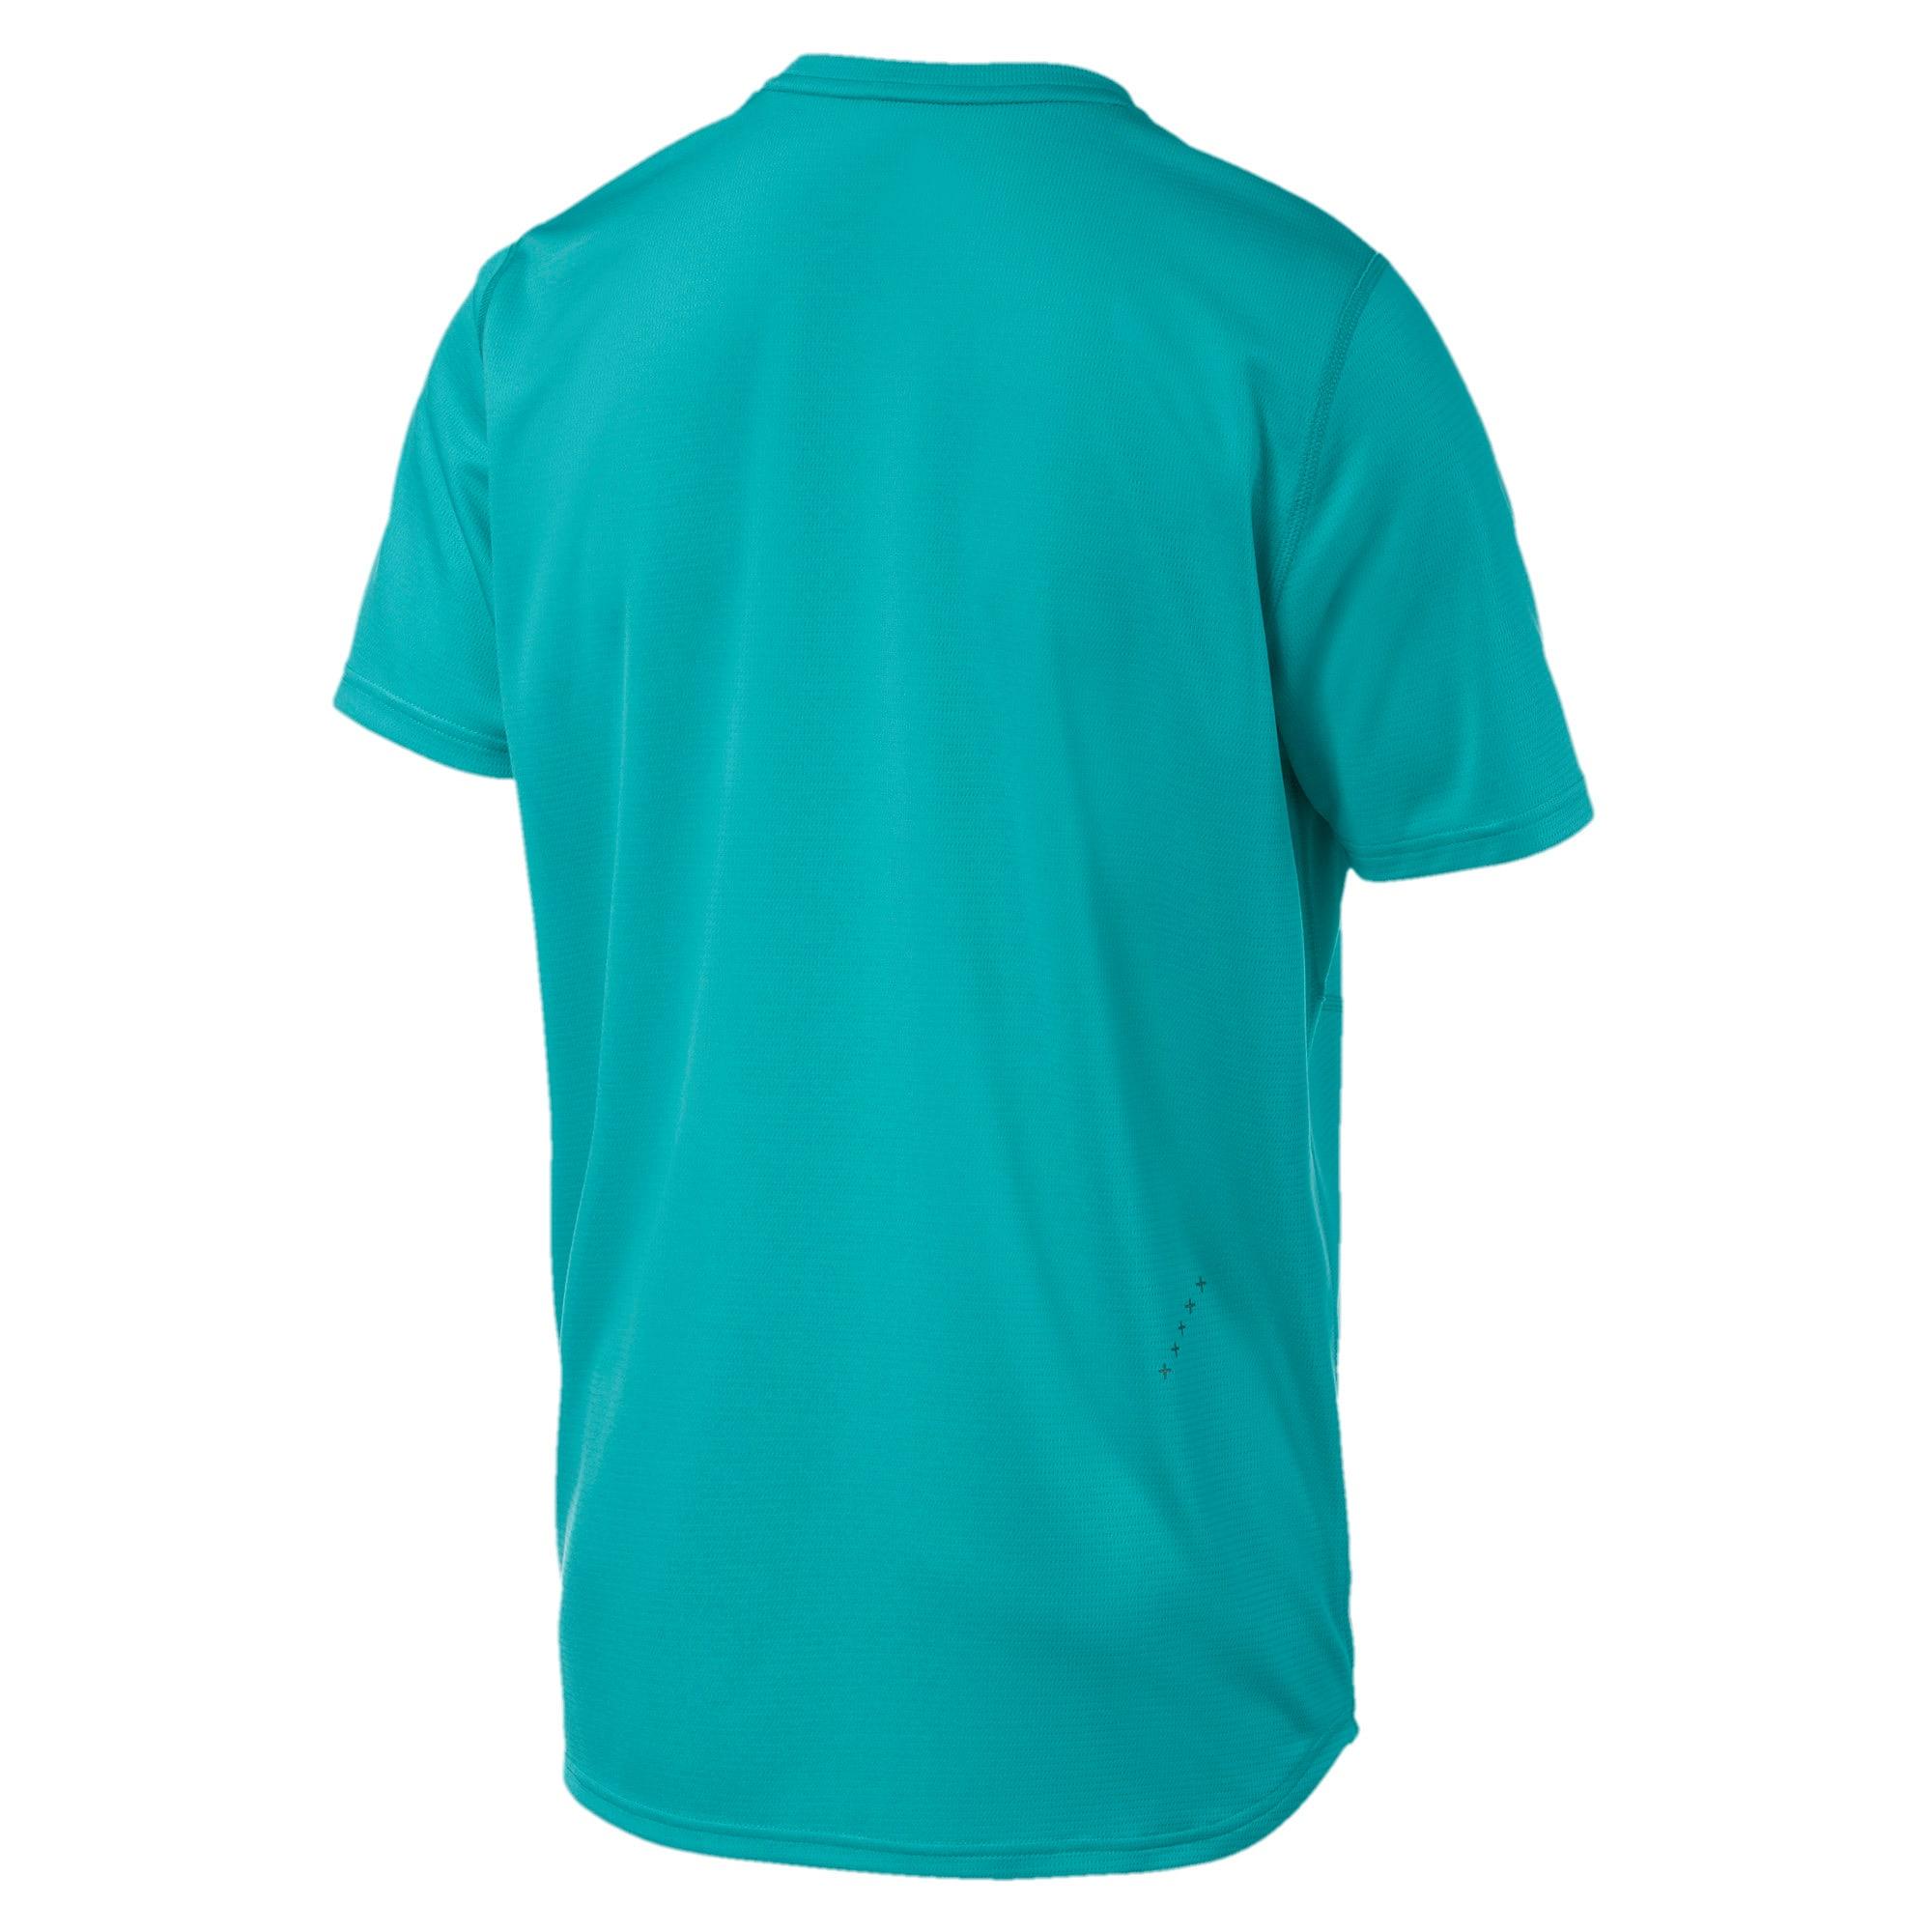 Thumbnail 5 of IGNITE Men's Running T-Shirt, Blue Turquoise, medium